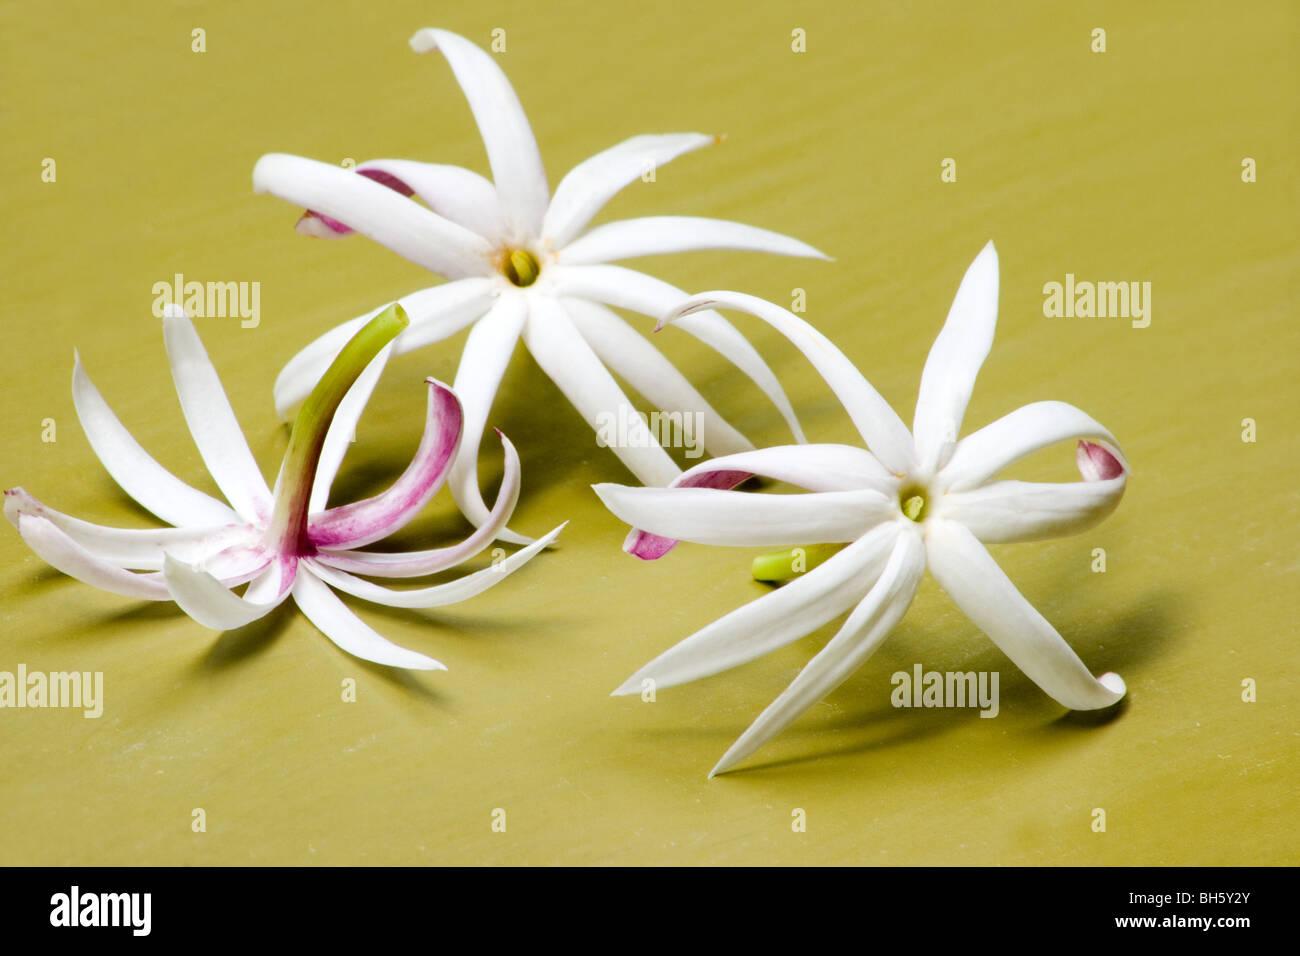 Jasmine flowers on green background - Stock Image